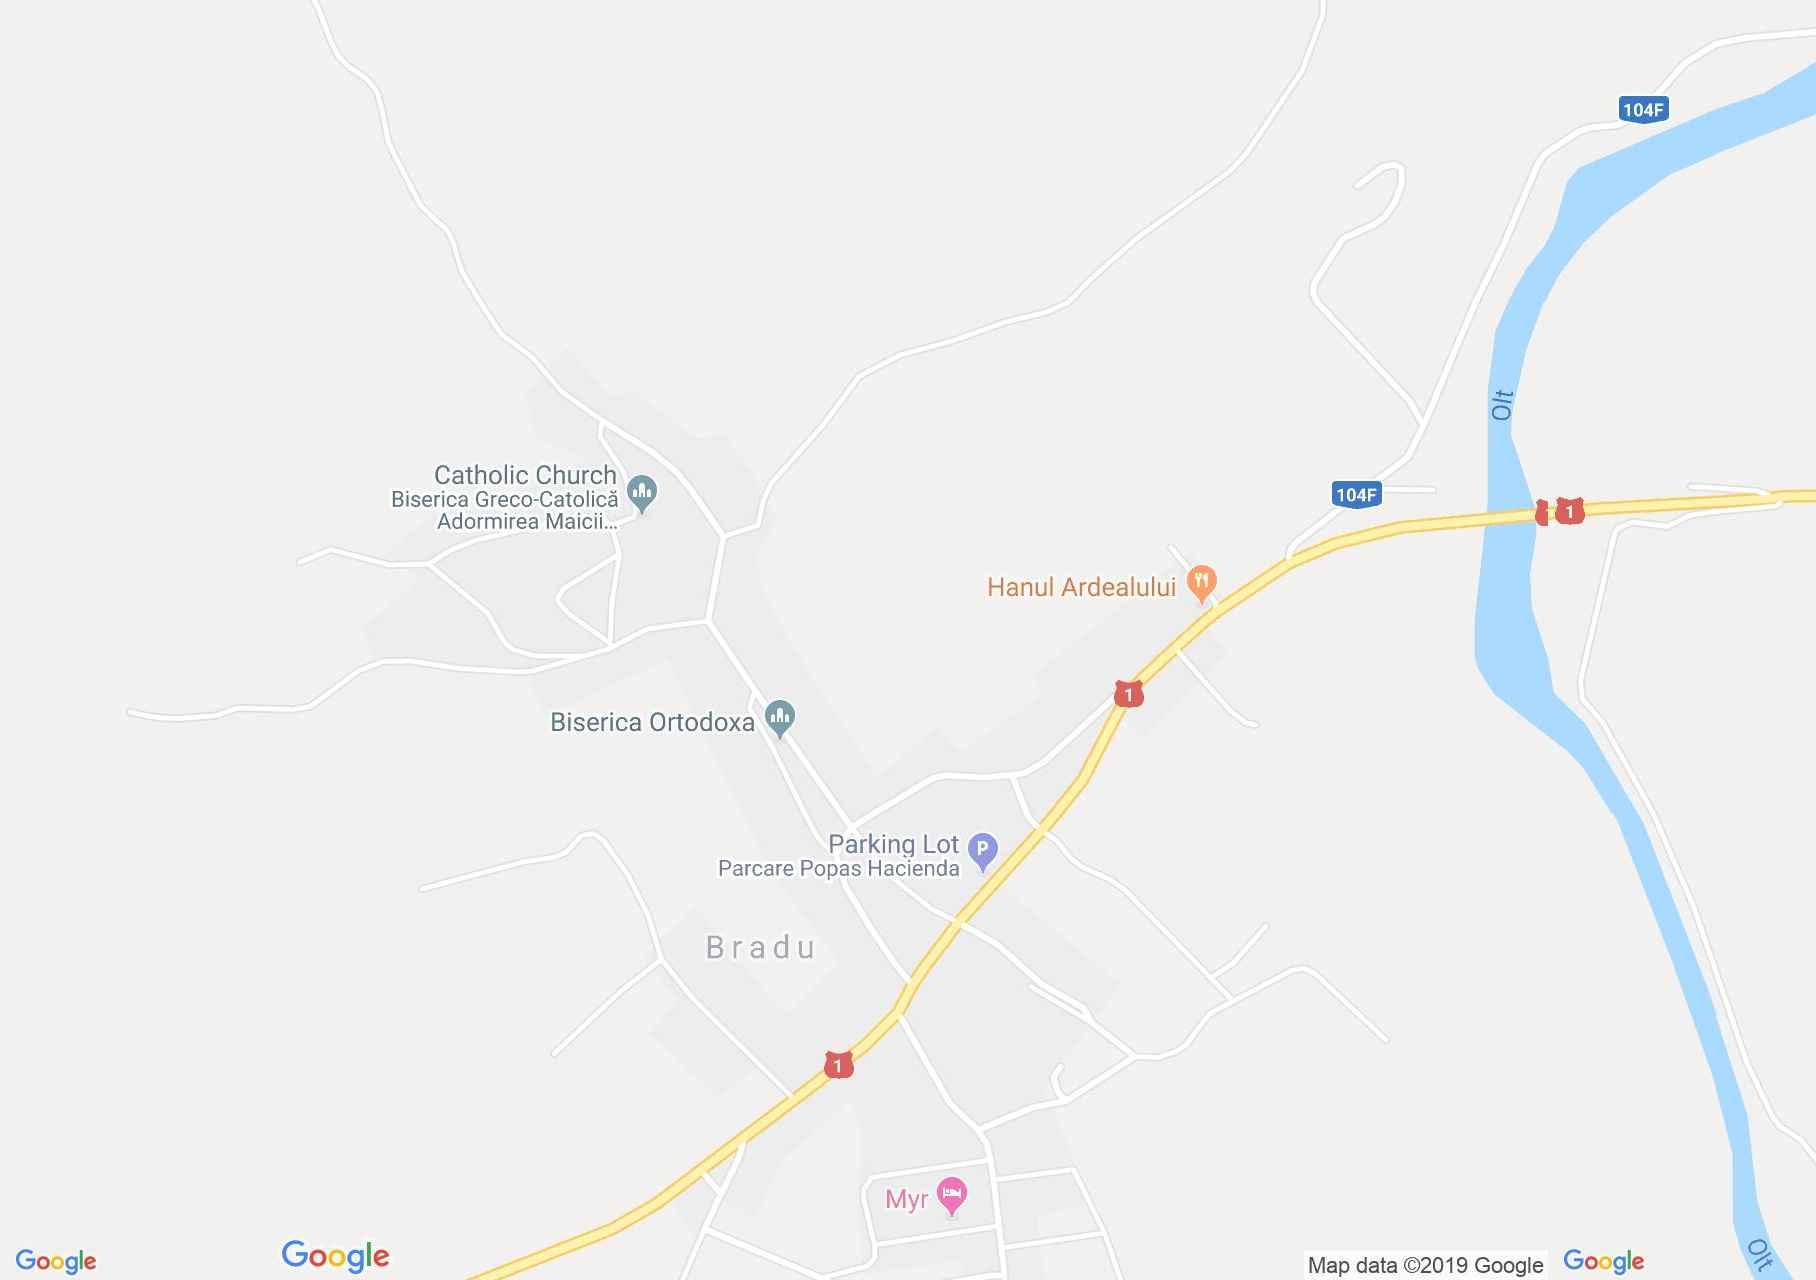 Map of Bradu: Evangelical fortified church